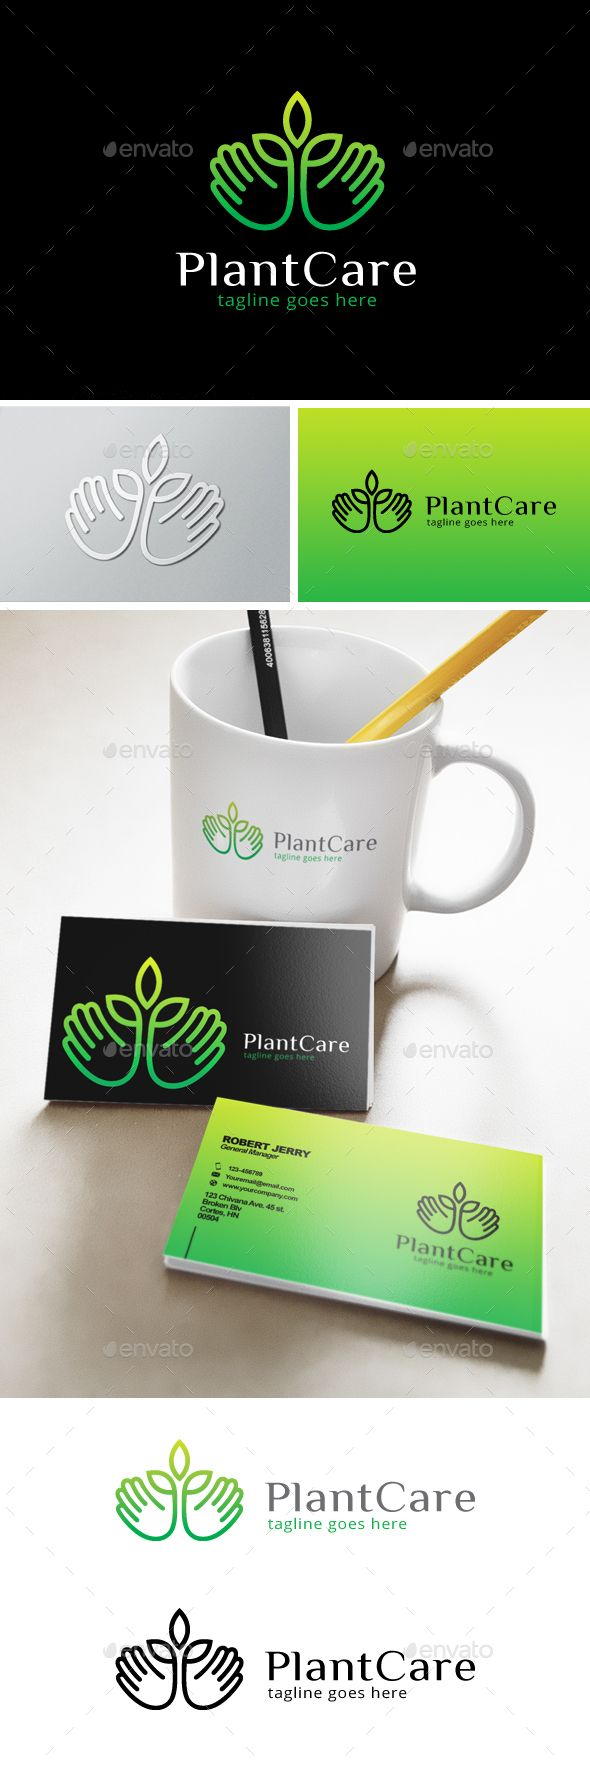 Plant Care Logo Template Transparent PNG, Vector EPS, AI Illustrator #logotype Download here: http://graphicriver.net/item/plant-care-logo/14402759?ref=ksioks